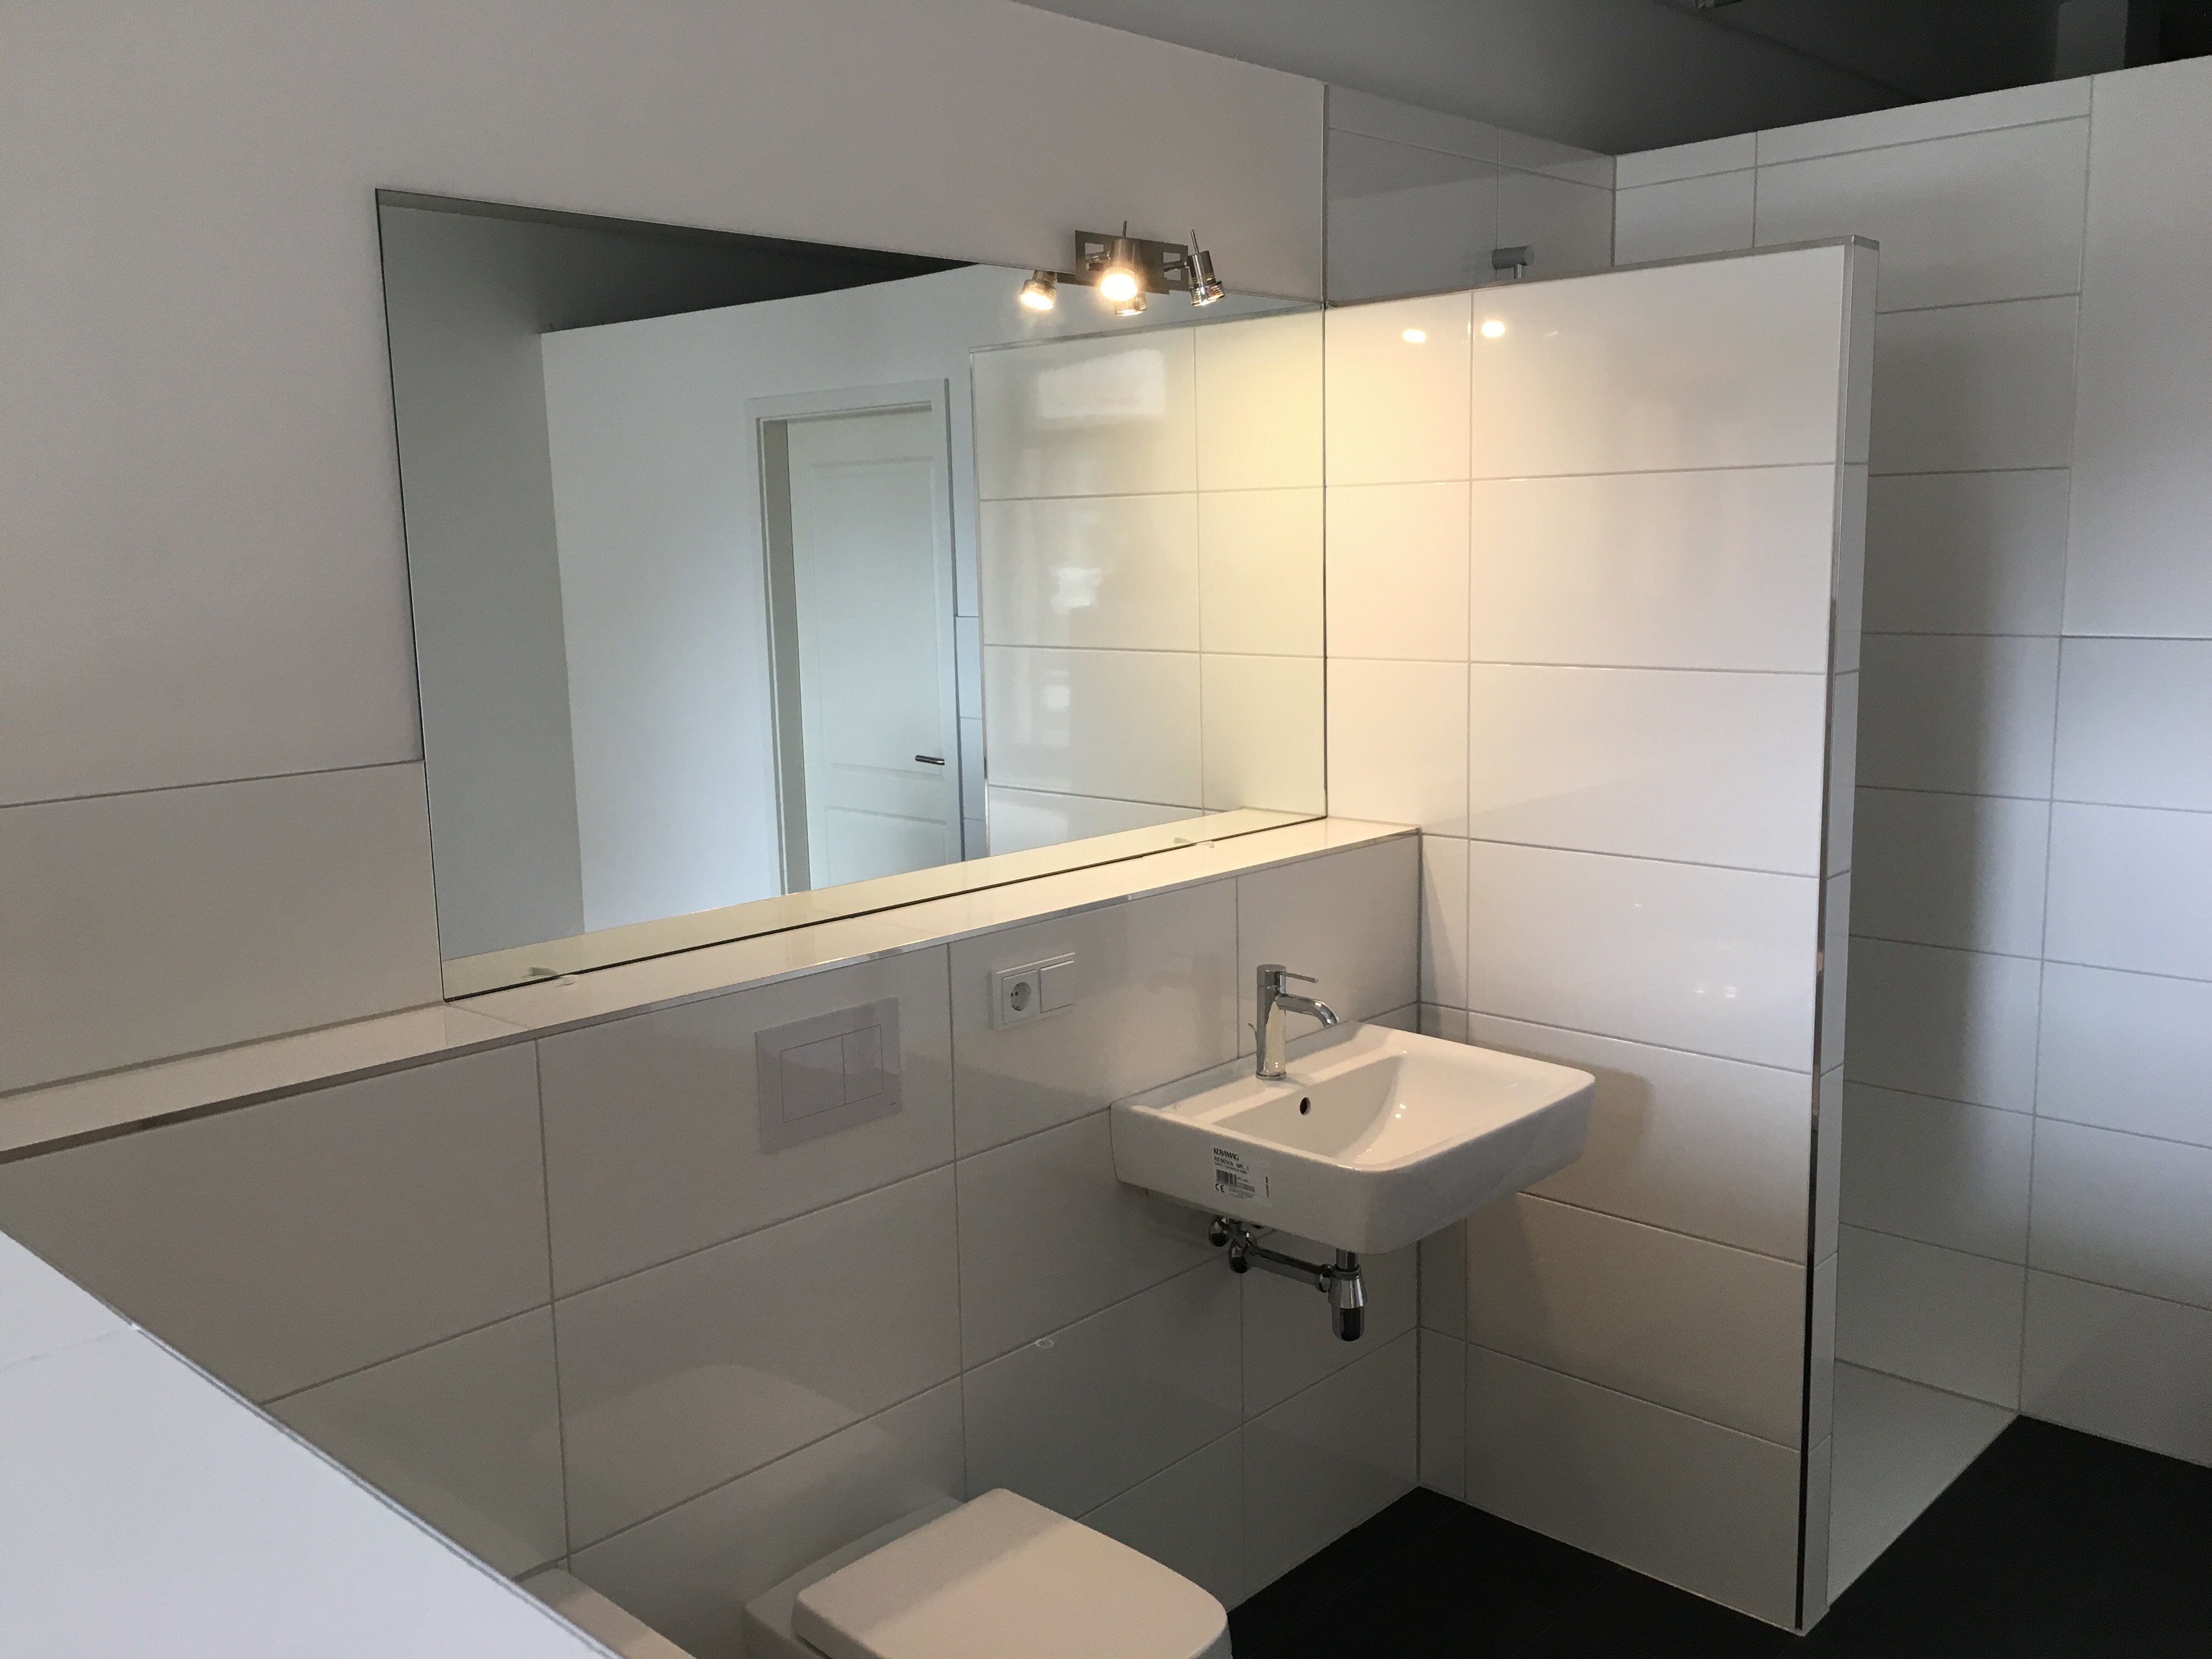 HanseKarree - Badezimmer - Showroom | Hanse Karree, Glatter Aal